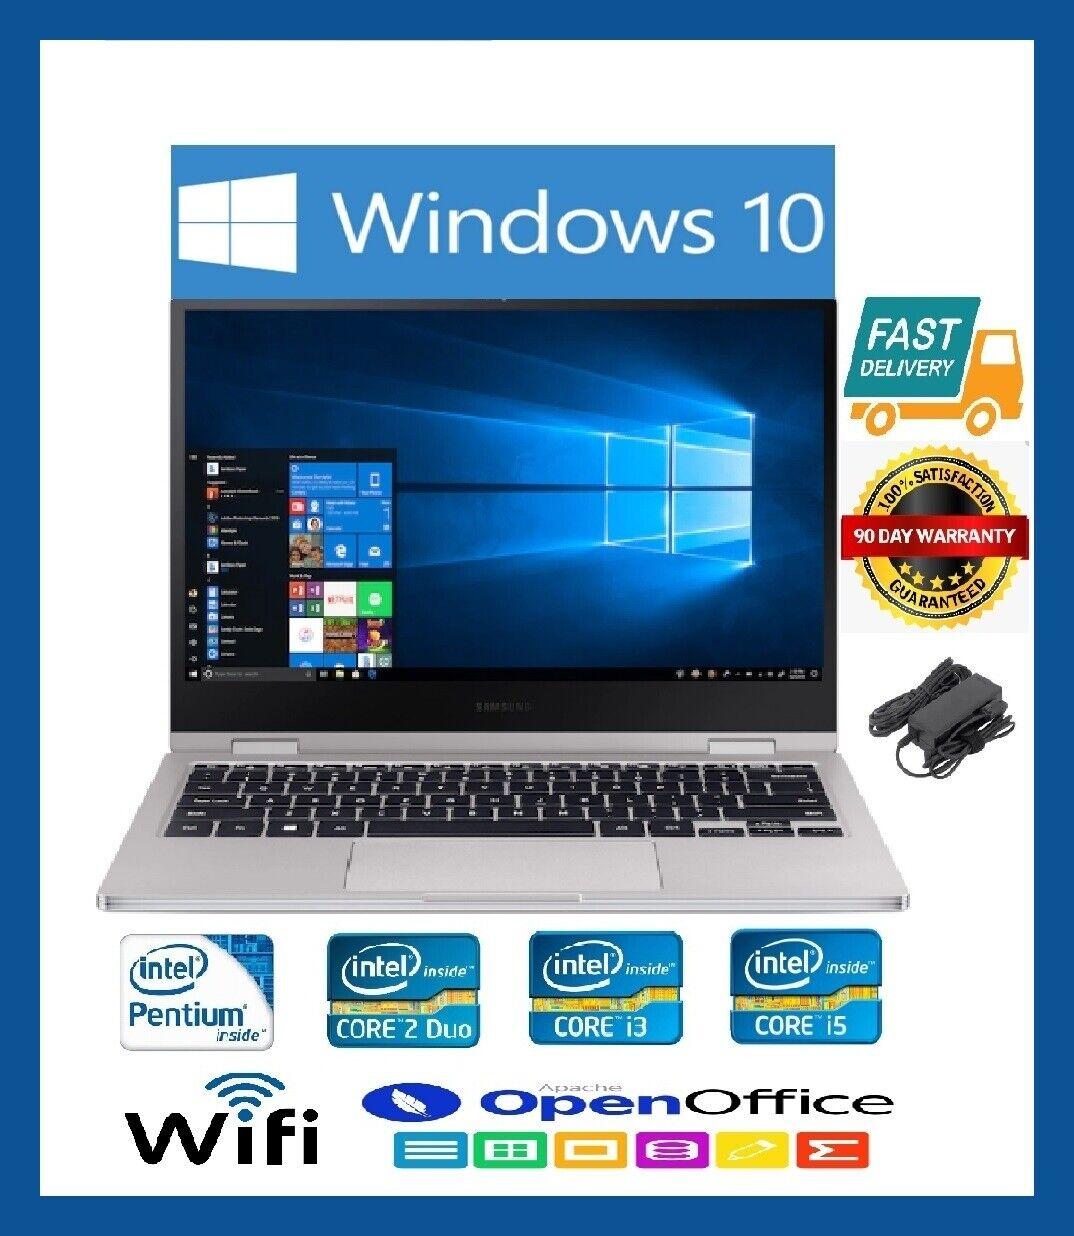 Laptop Windows - CHEAP FAST WINDOWS 10 LAPTOP 4GB 6GB 8GB 12GB RAM WIFI HDD/SSD WARRANTY